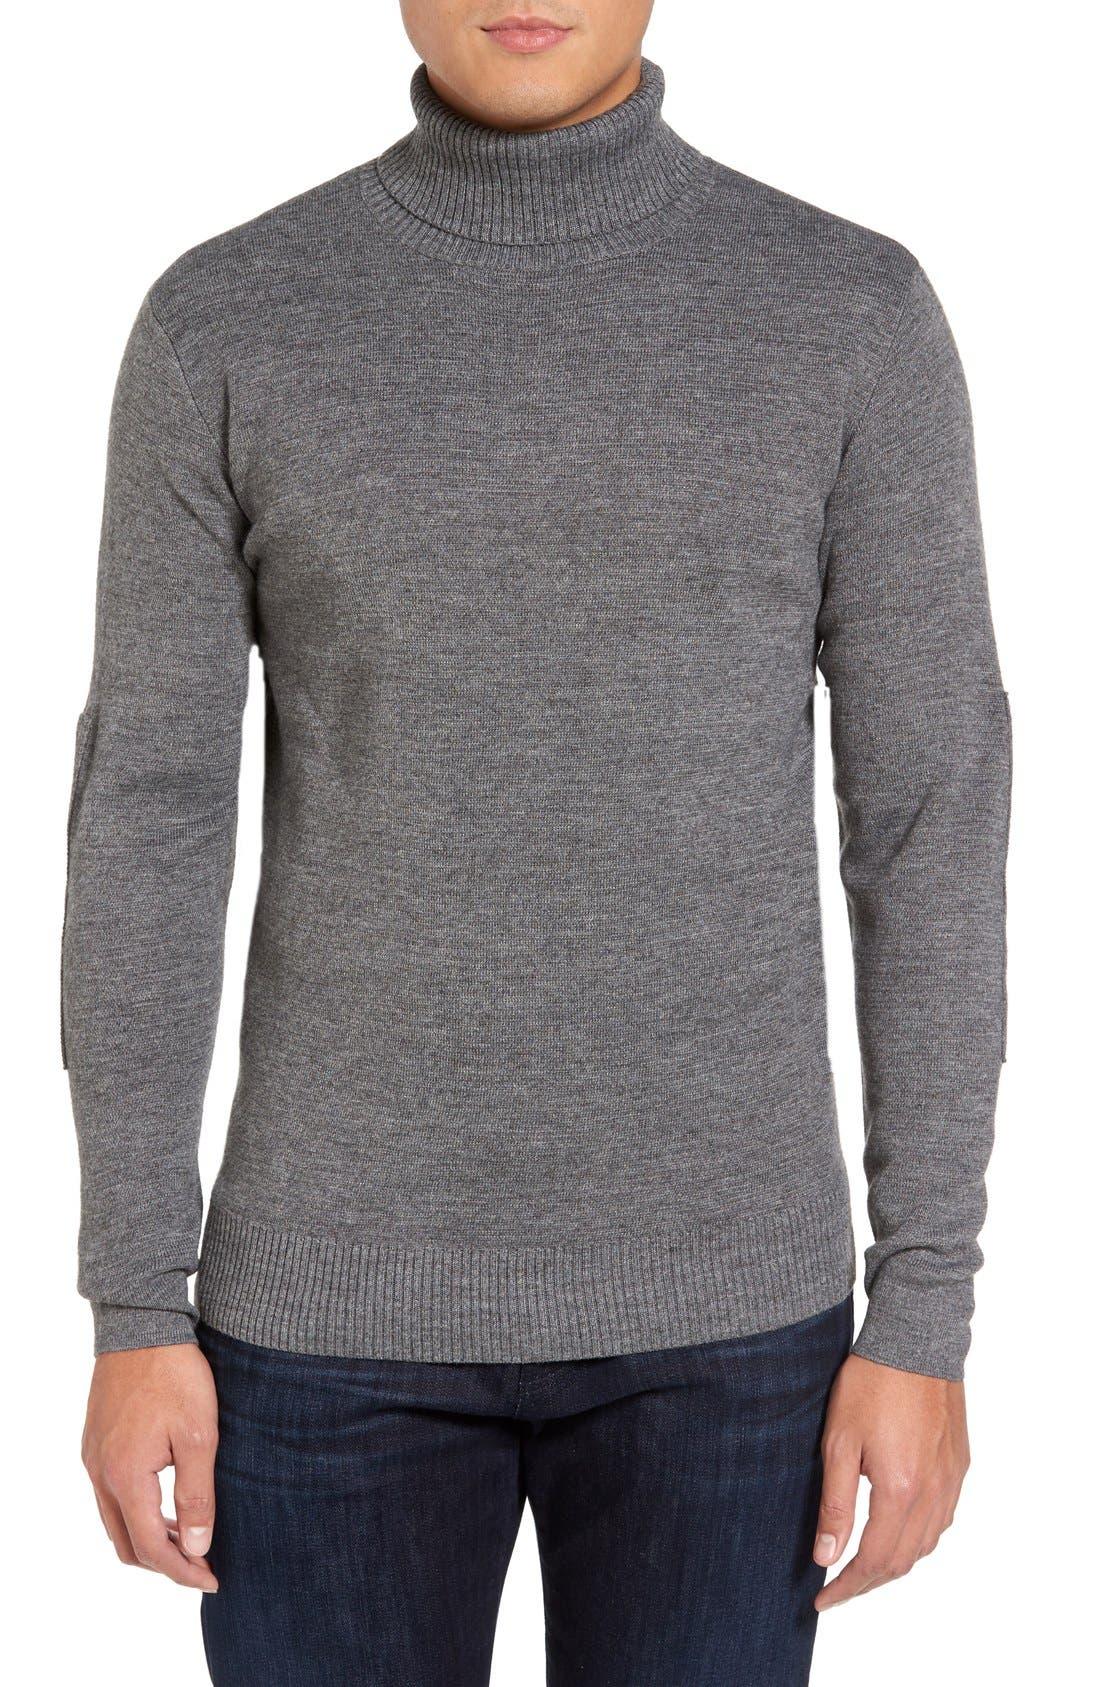 Merino Wool Blend Turtleneck Sweater,                         Main,                         color, 020